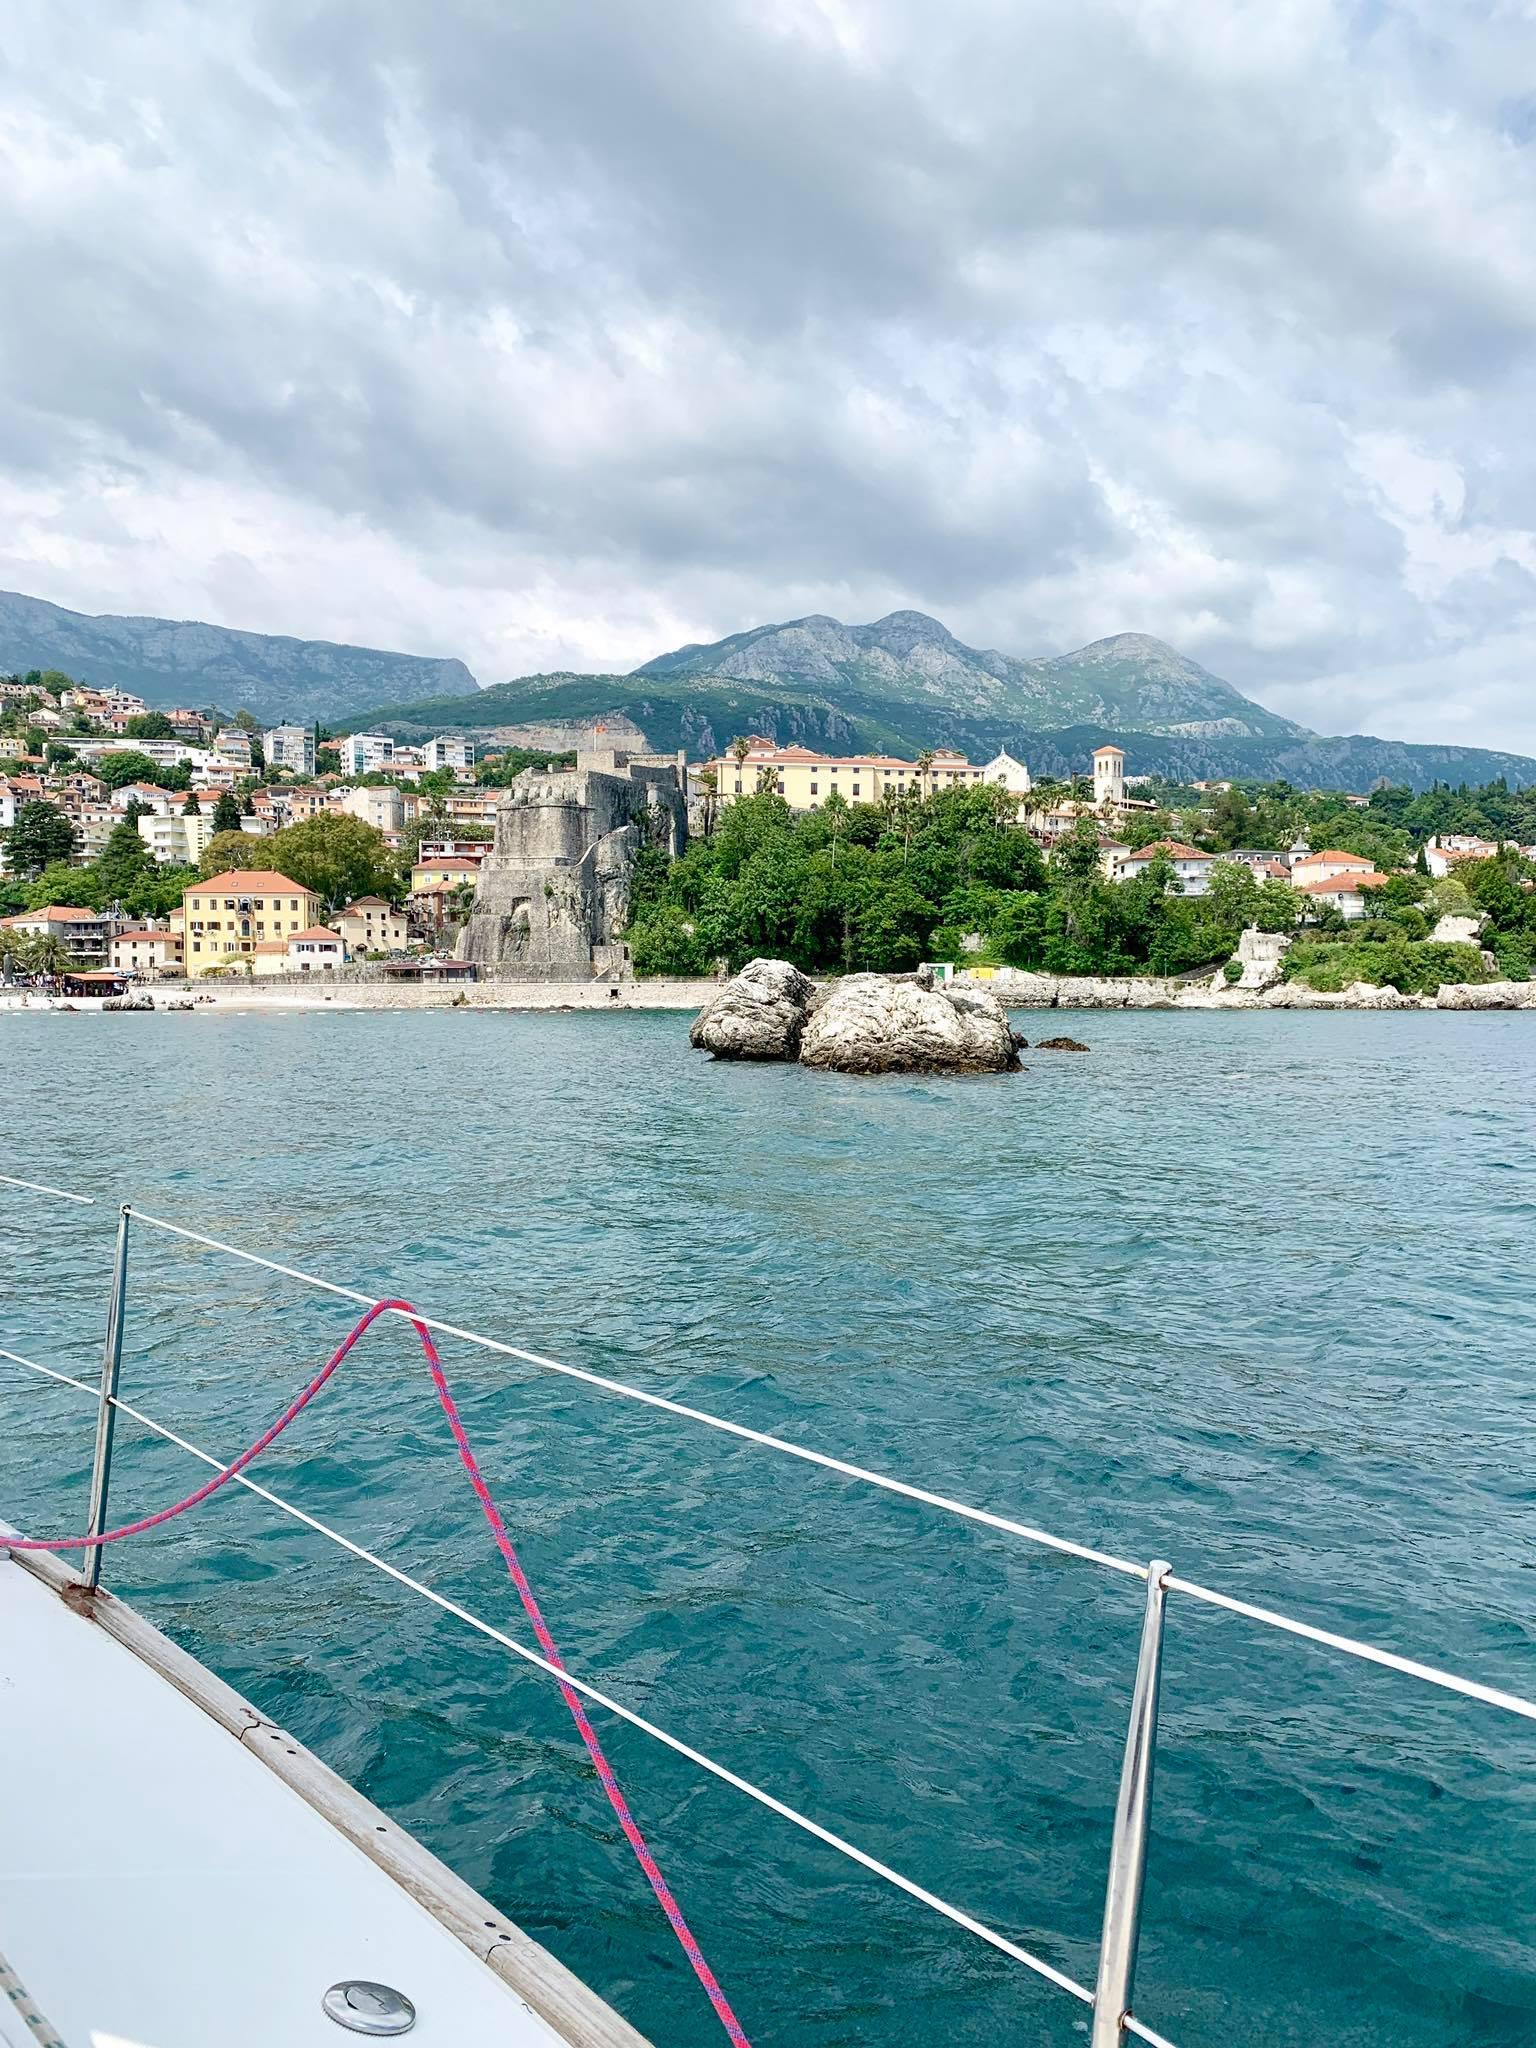 Expat Life in Montenegro Day 2 First full day in Herceg Novi1.jpg